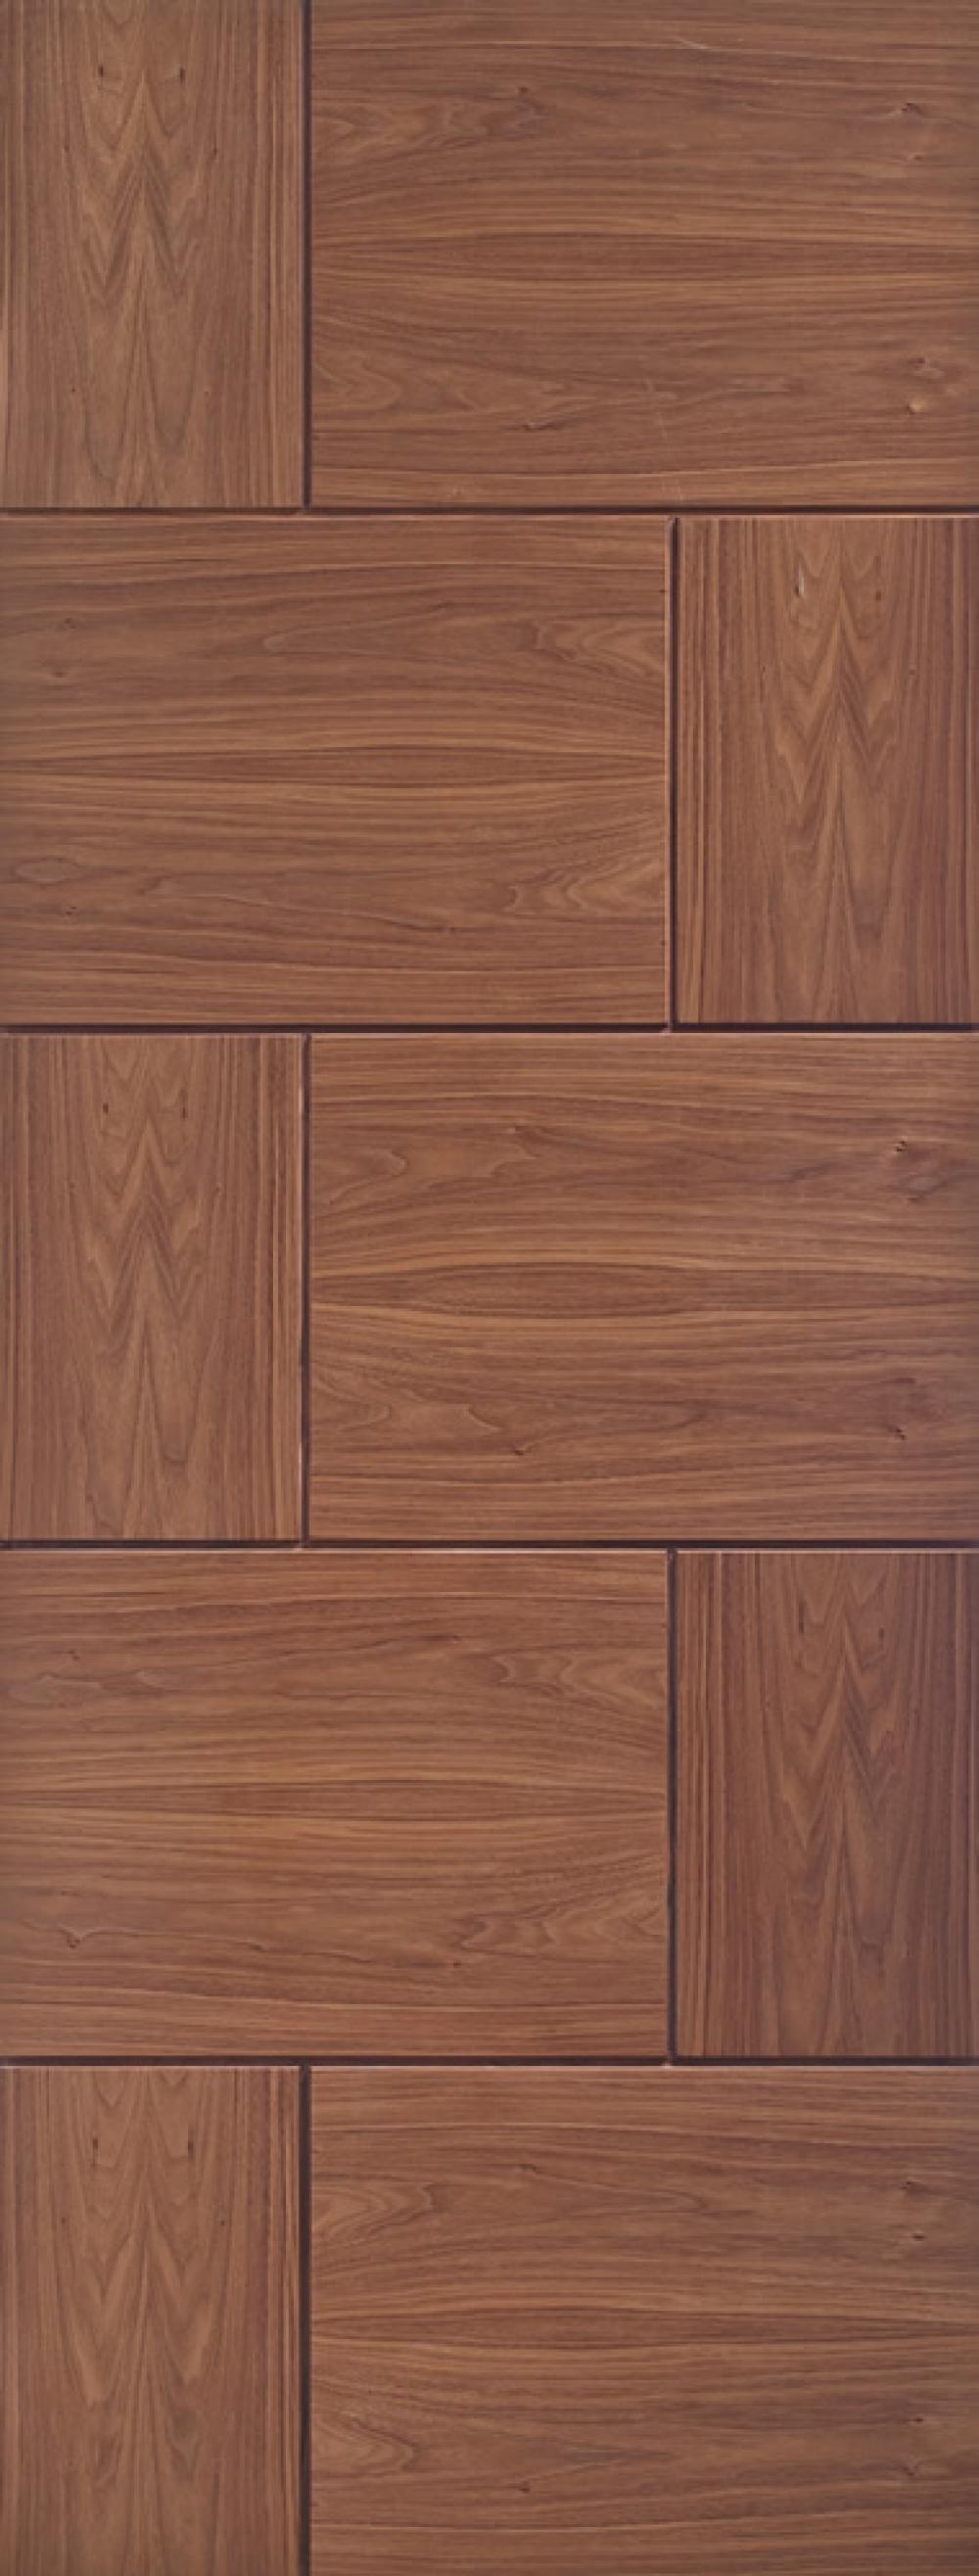 Ravenna Walnut  Door - PREFINISHED